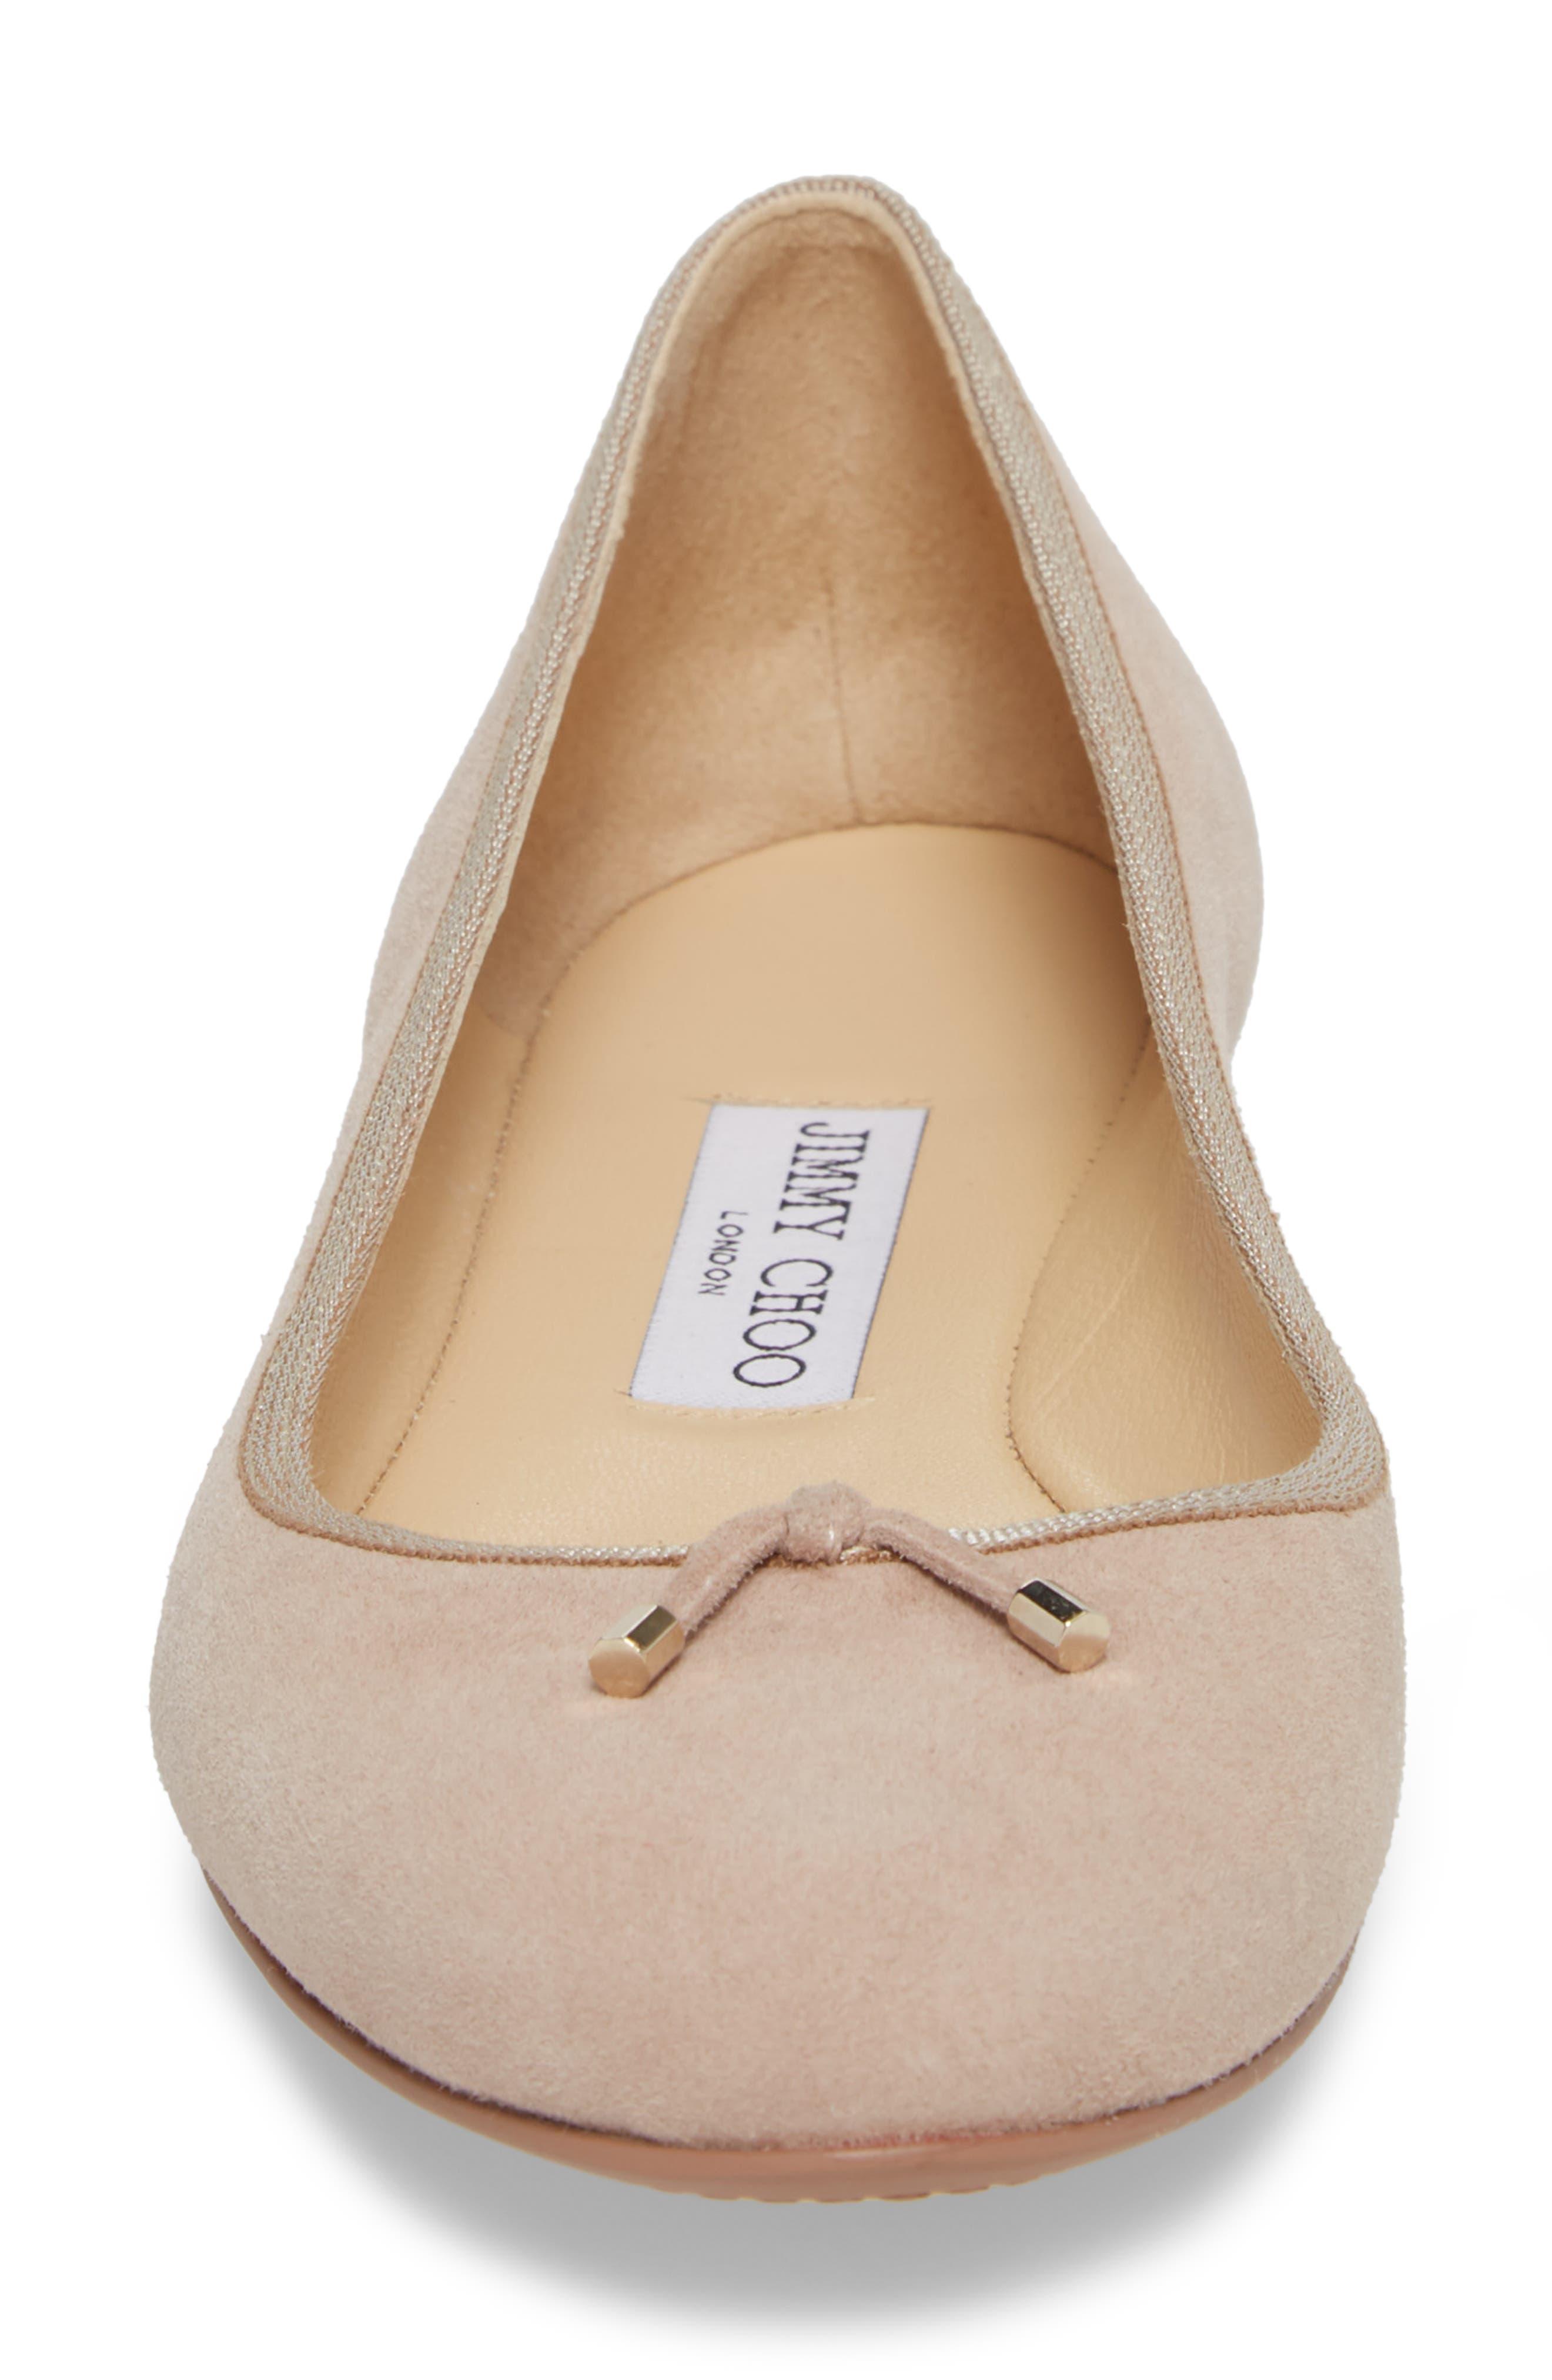 Jennie Ballet Flat,                             Alternate thumbnail 4, color,                             680